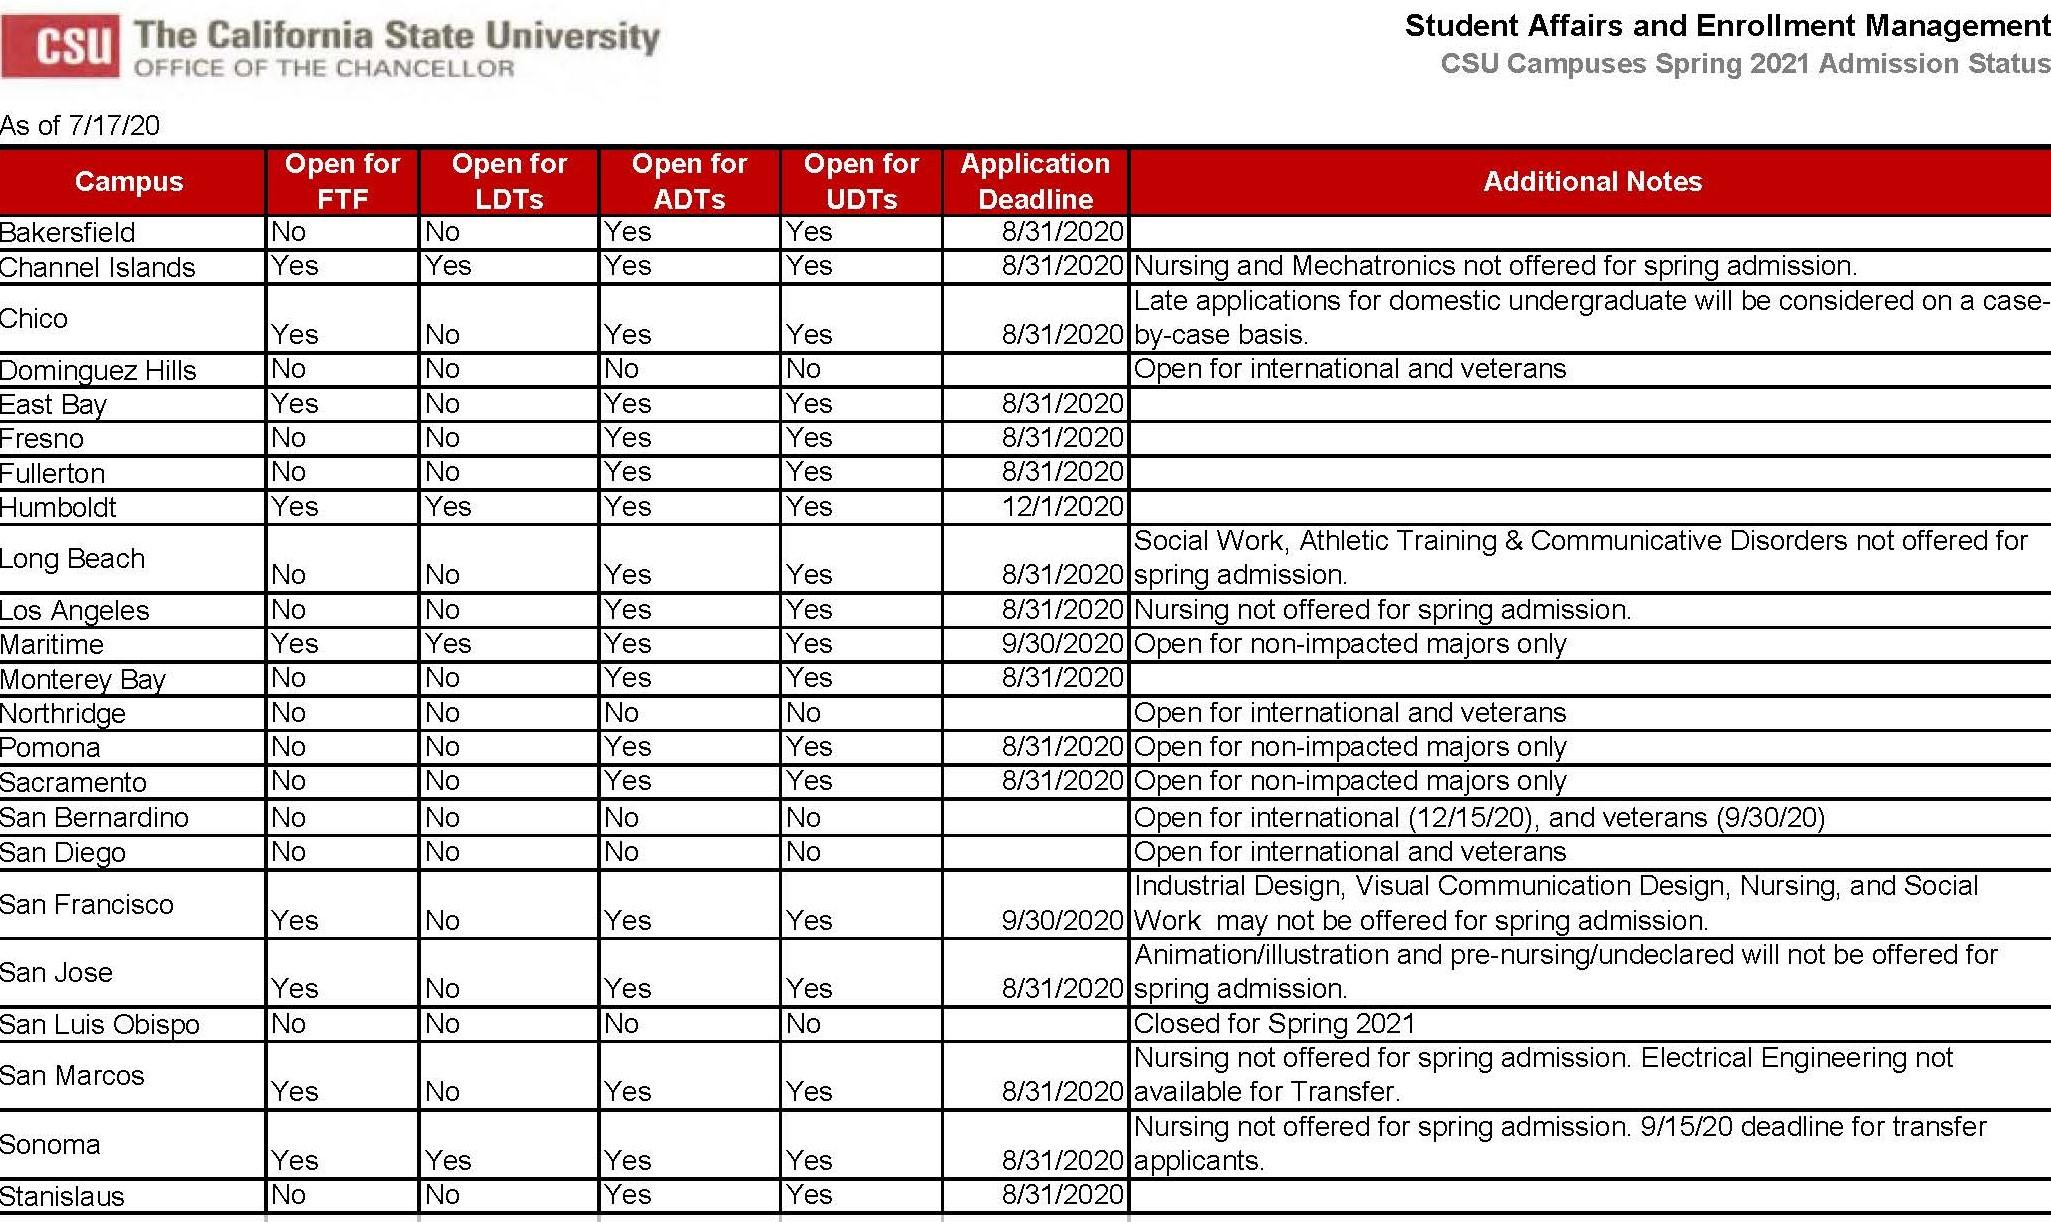 CSU Spring 2021 application status